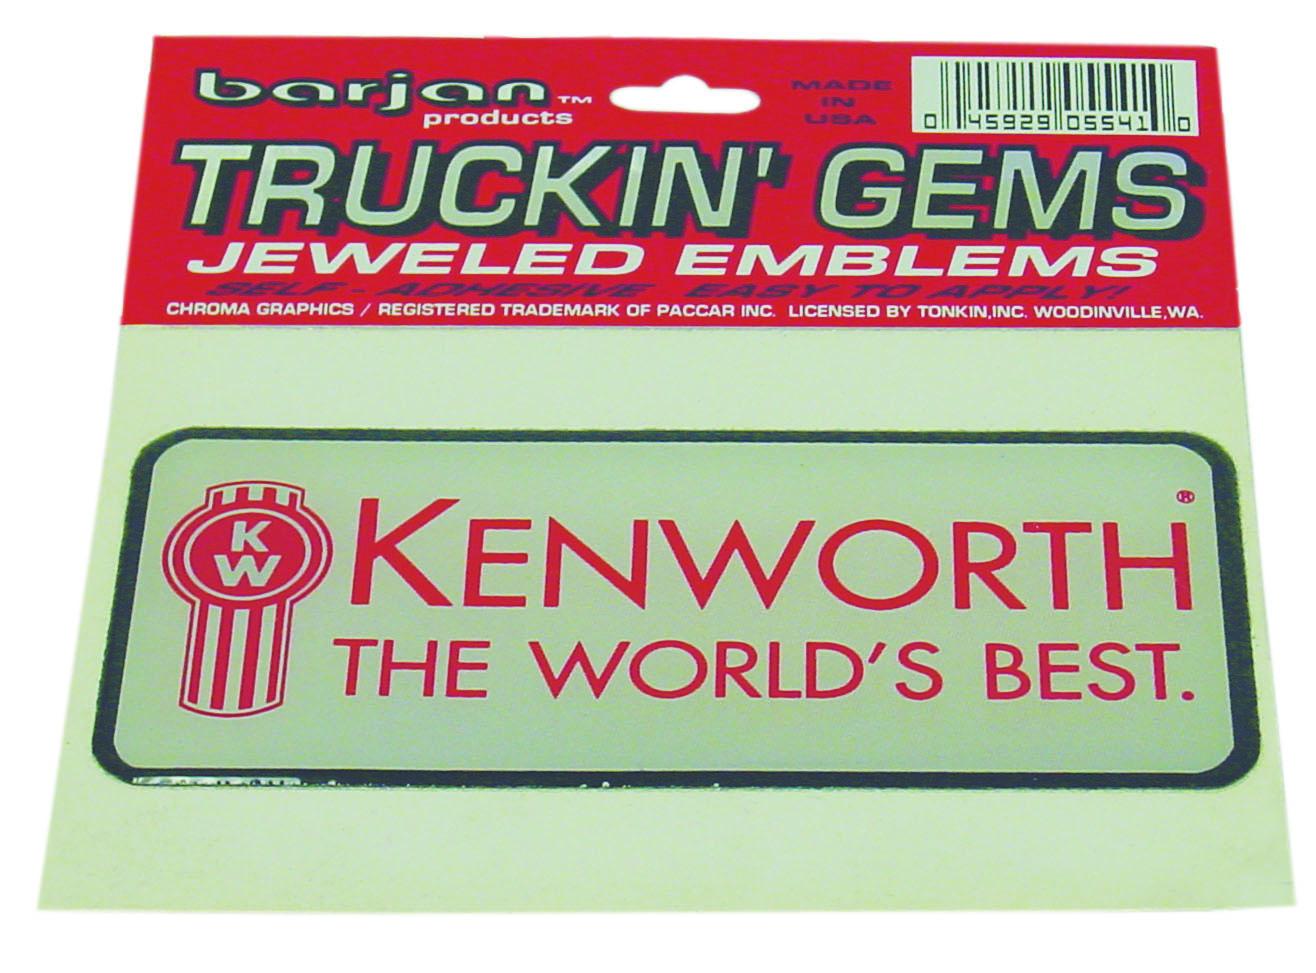 0455541 - Kenworth Truckin Gems Jeweled Reflective Decal